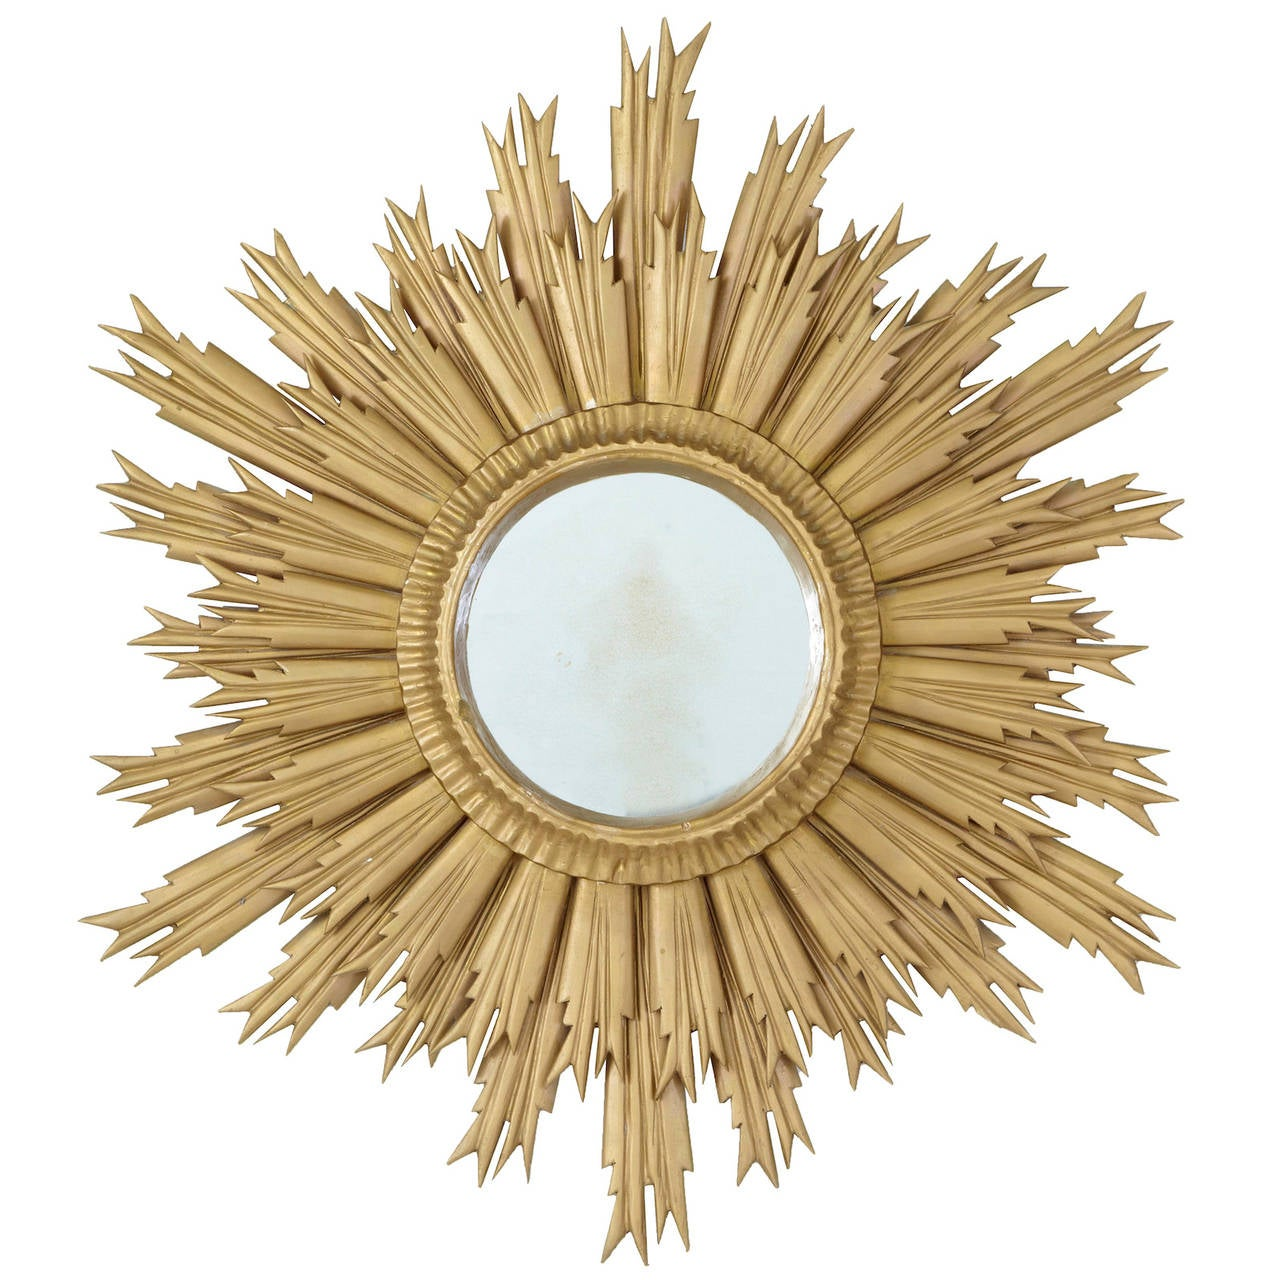 20th century late art deco sunburst mirror for sale at 1stdibs for Sunburst mirror